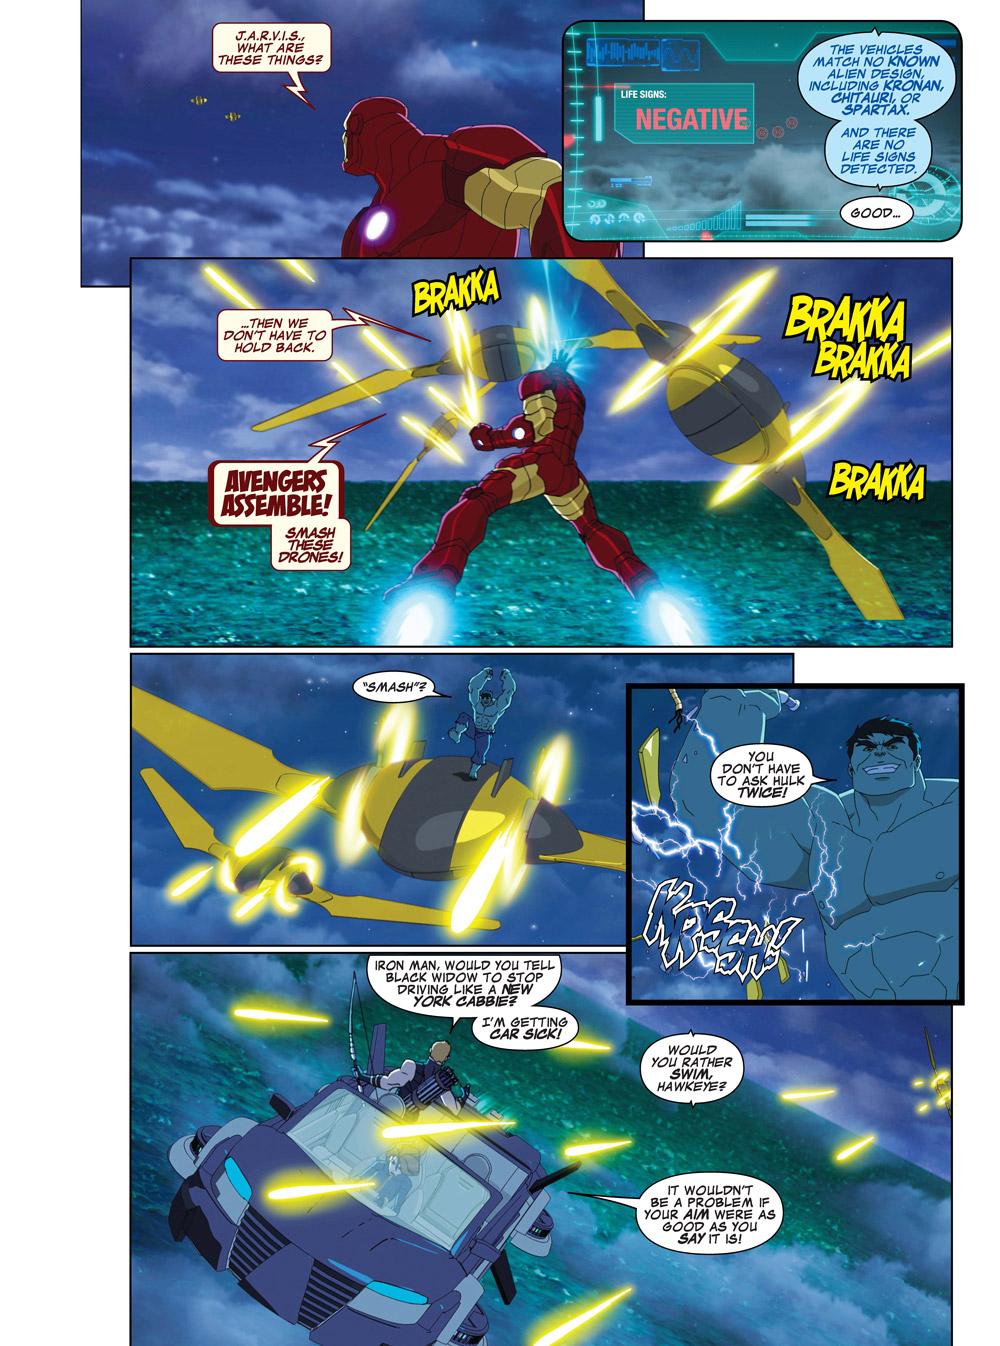 15_MUAVAssembleSeason2-1_001 ComicList Previews: MARVEL COMICS DIGEST #6 (AVENGERS VS THANOS)